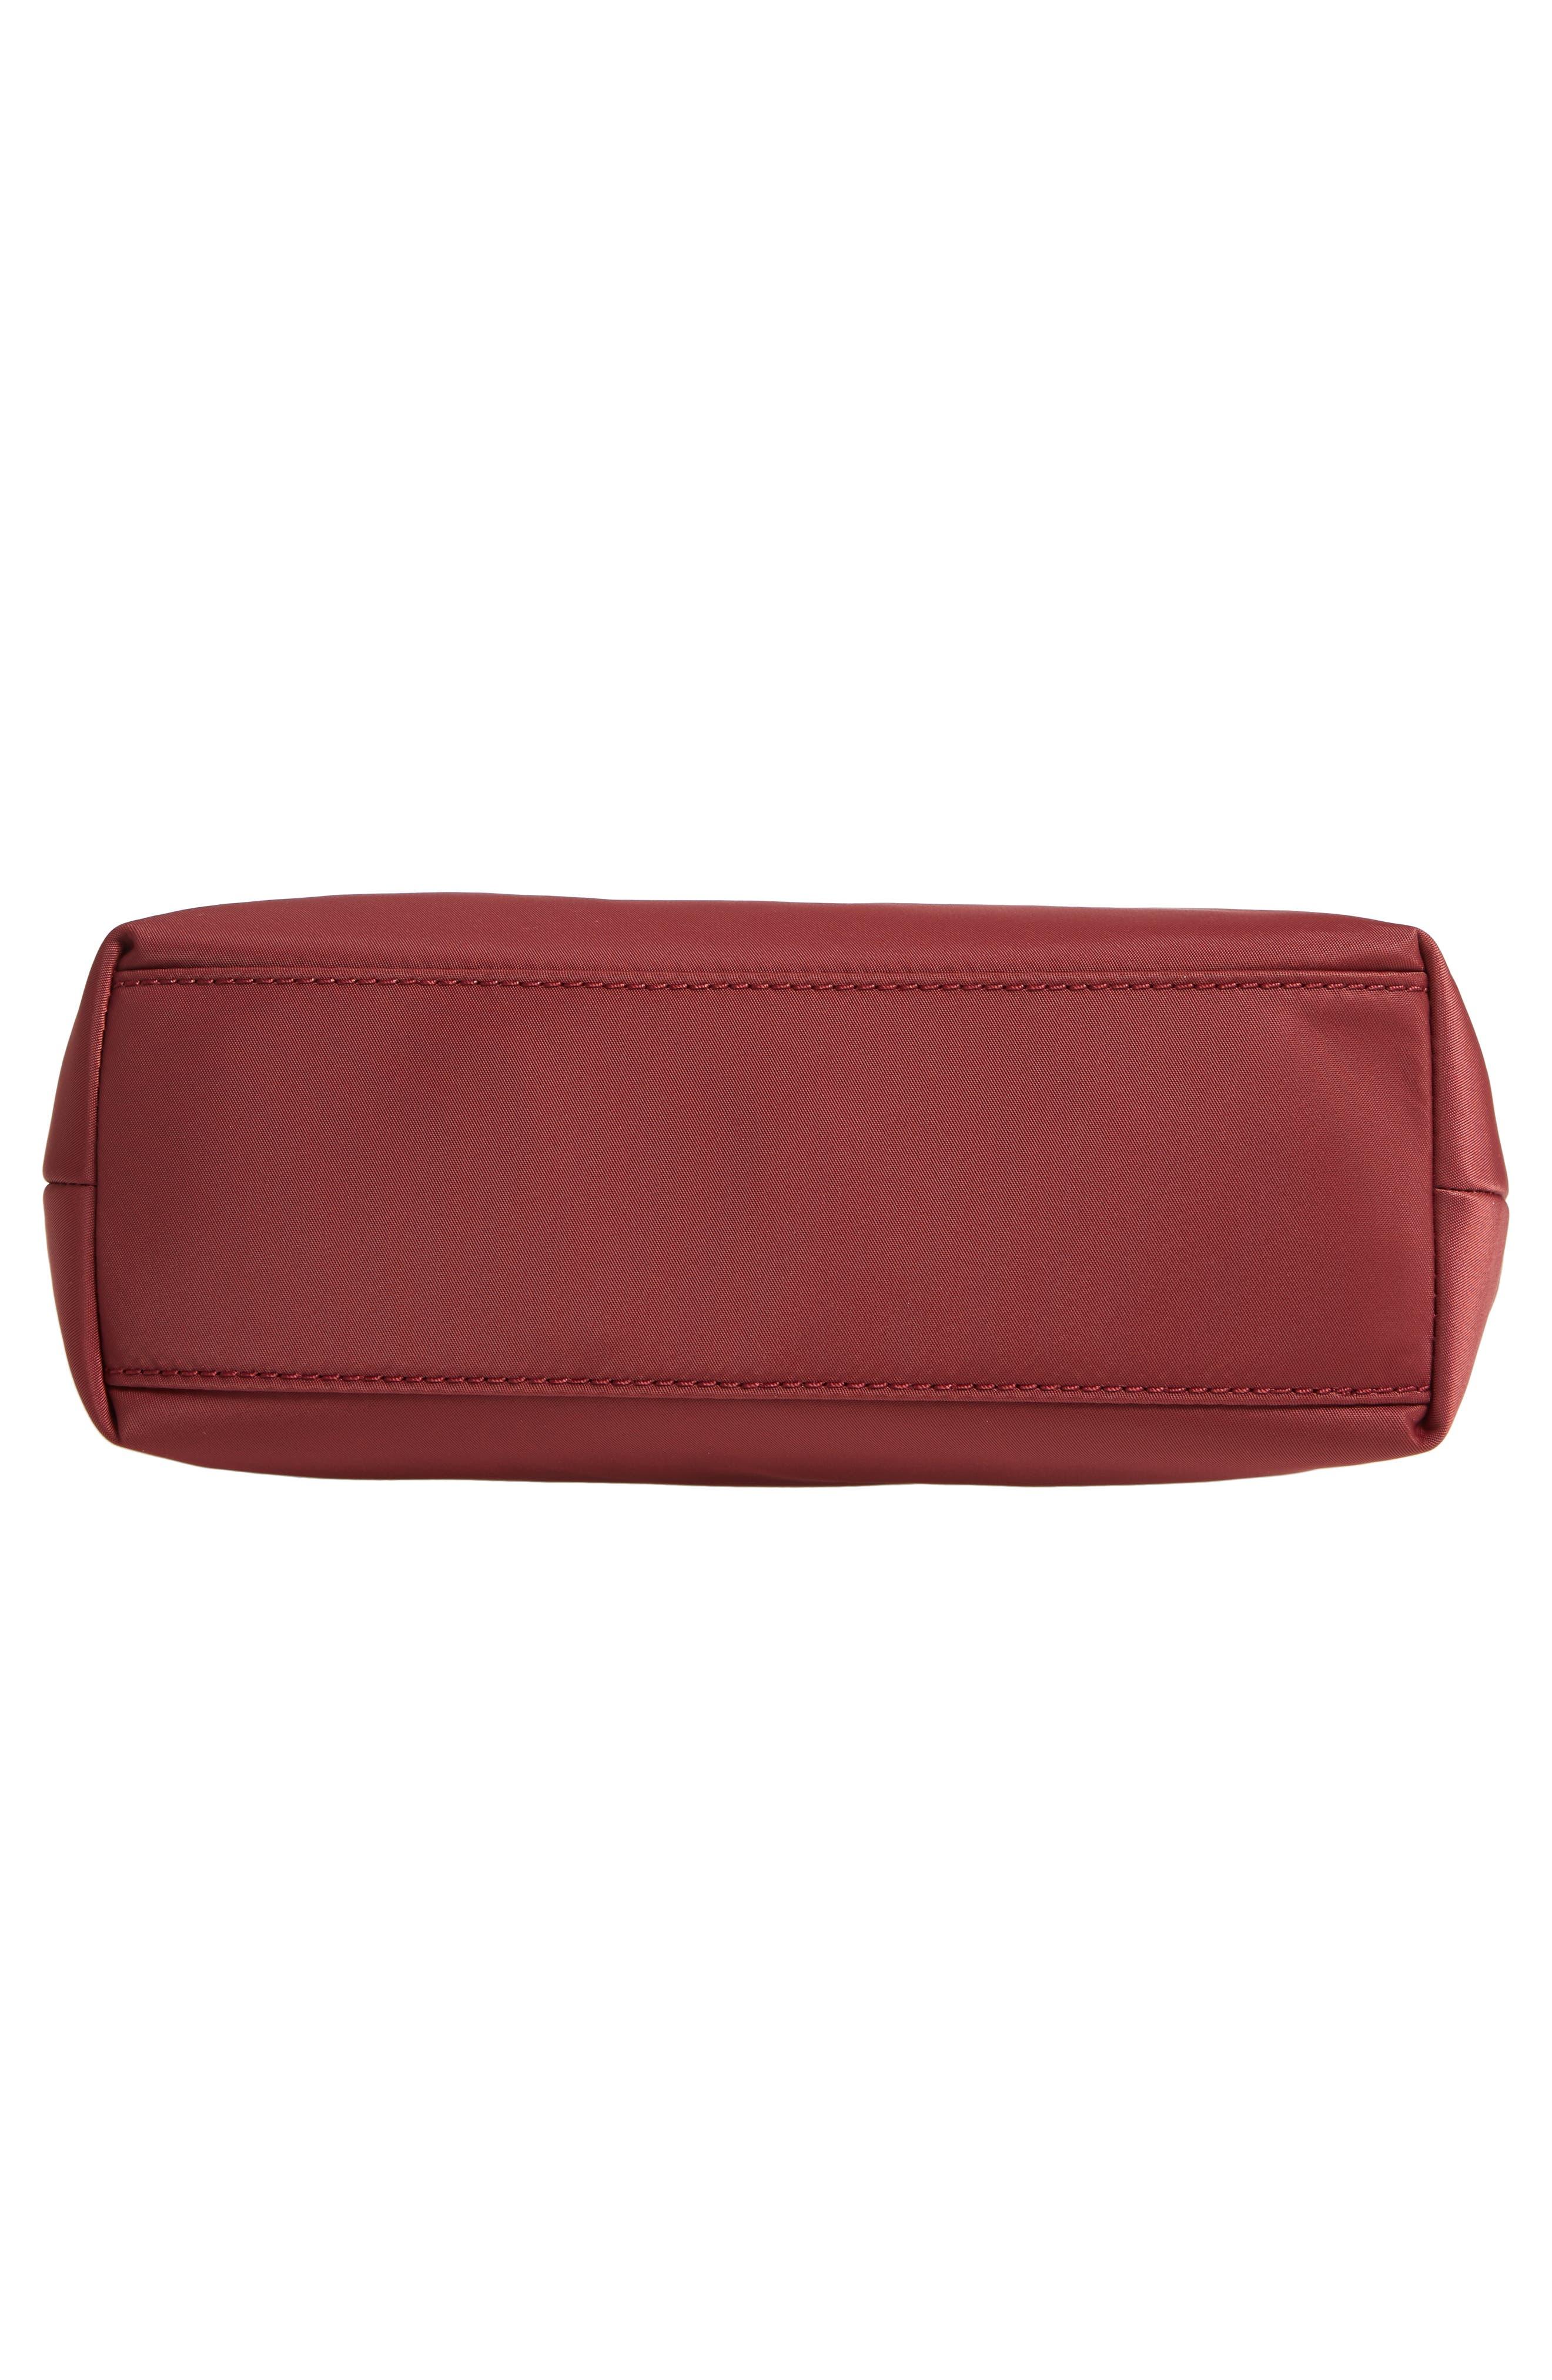 ,                             watson lane - lucie nylon crossbody bag,                             Alternate thumbnail 20, color,                             600